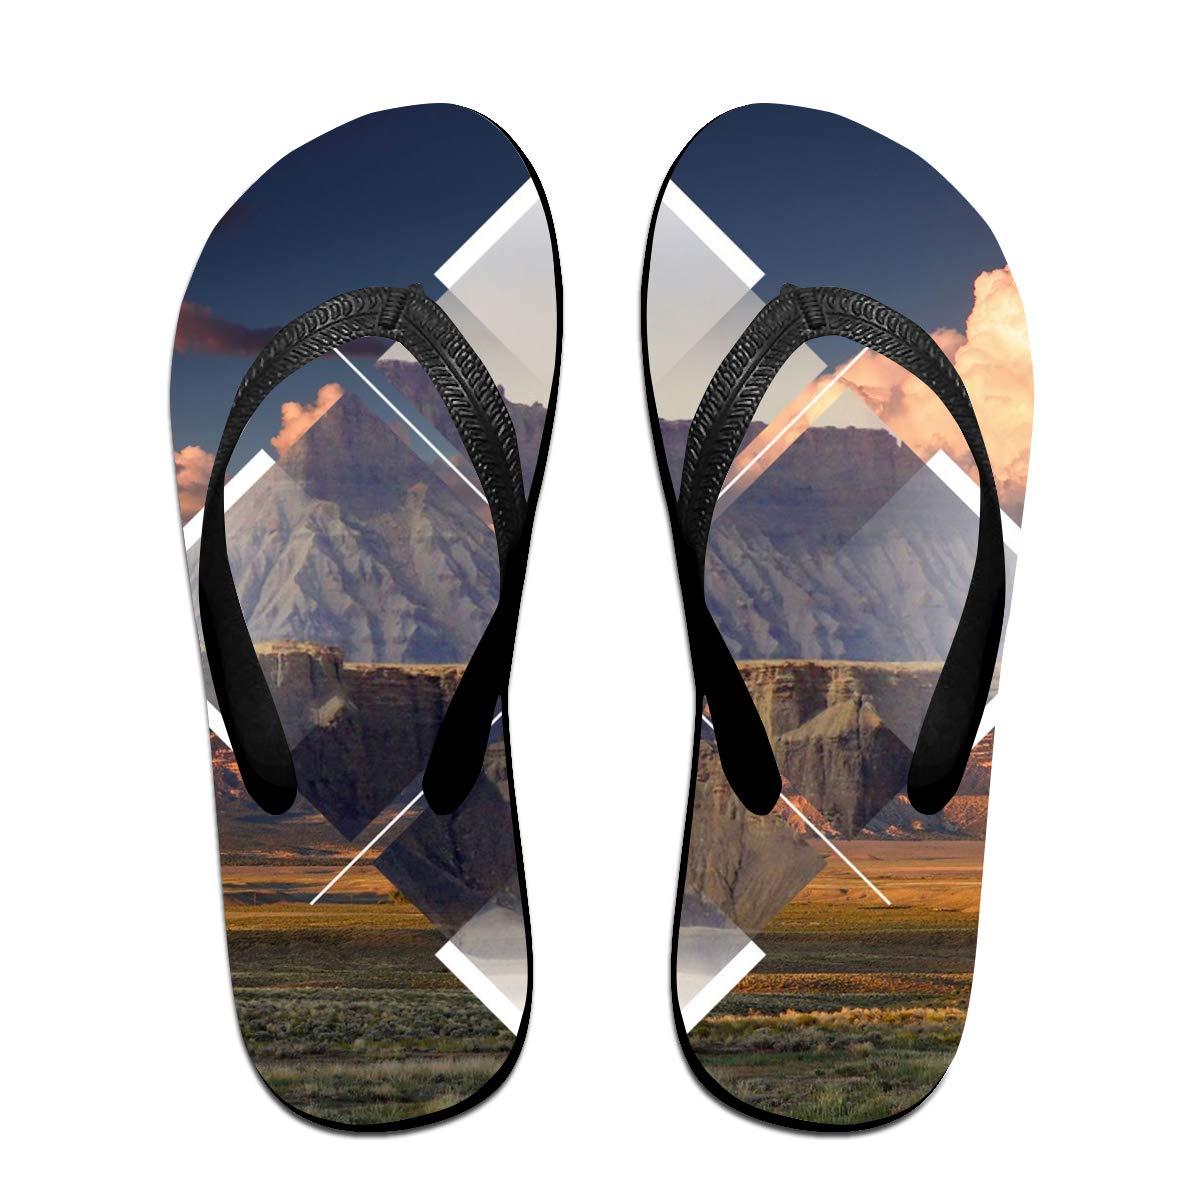 Couple Slipper Polyscape Diamond Nature Print Flip Flops Unisex Chic Sandals Rubber Non-Slip House Thong Slippers